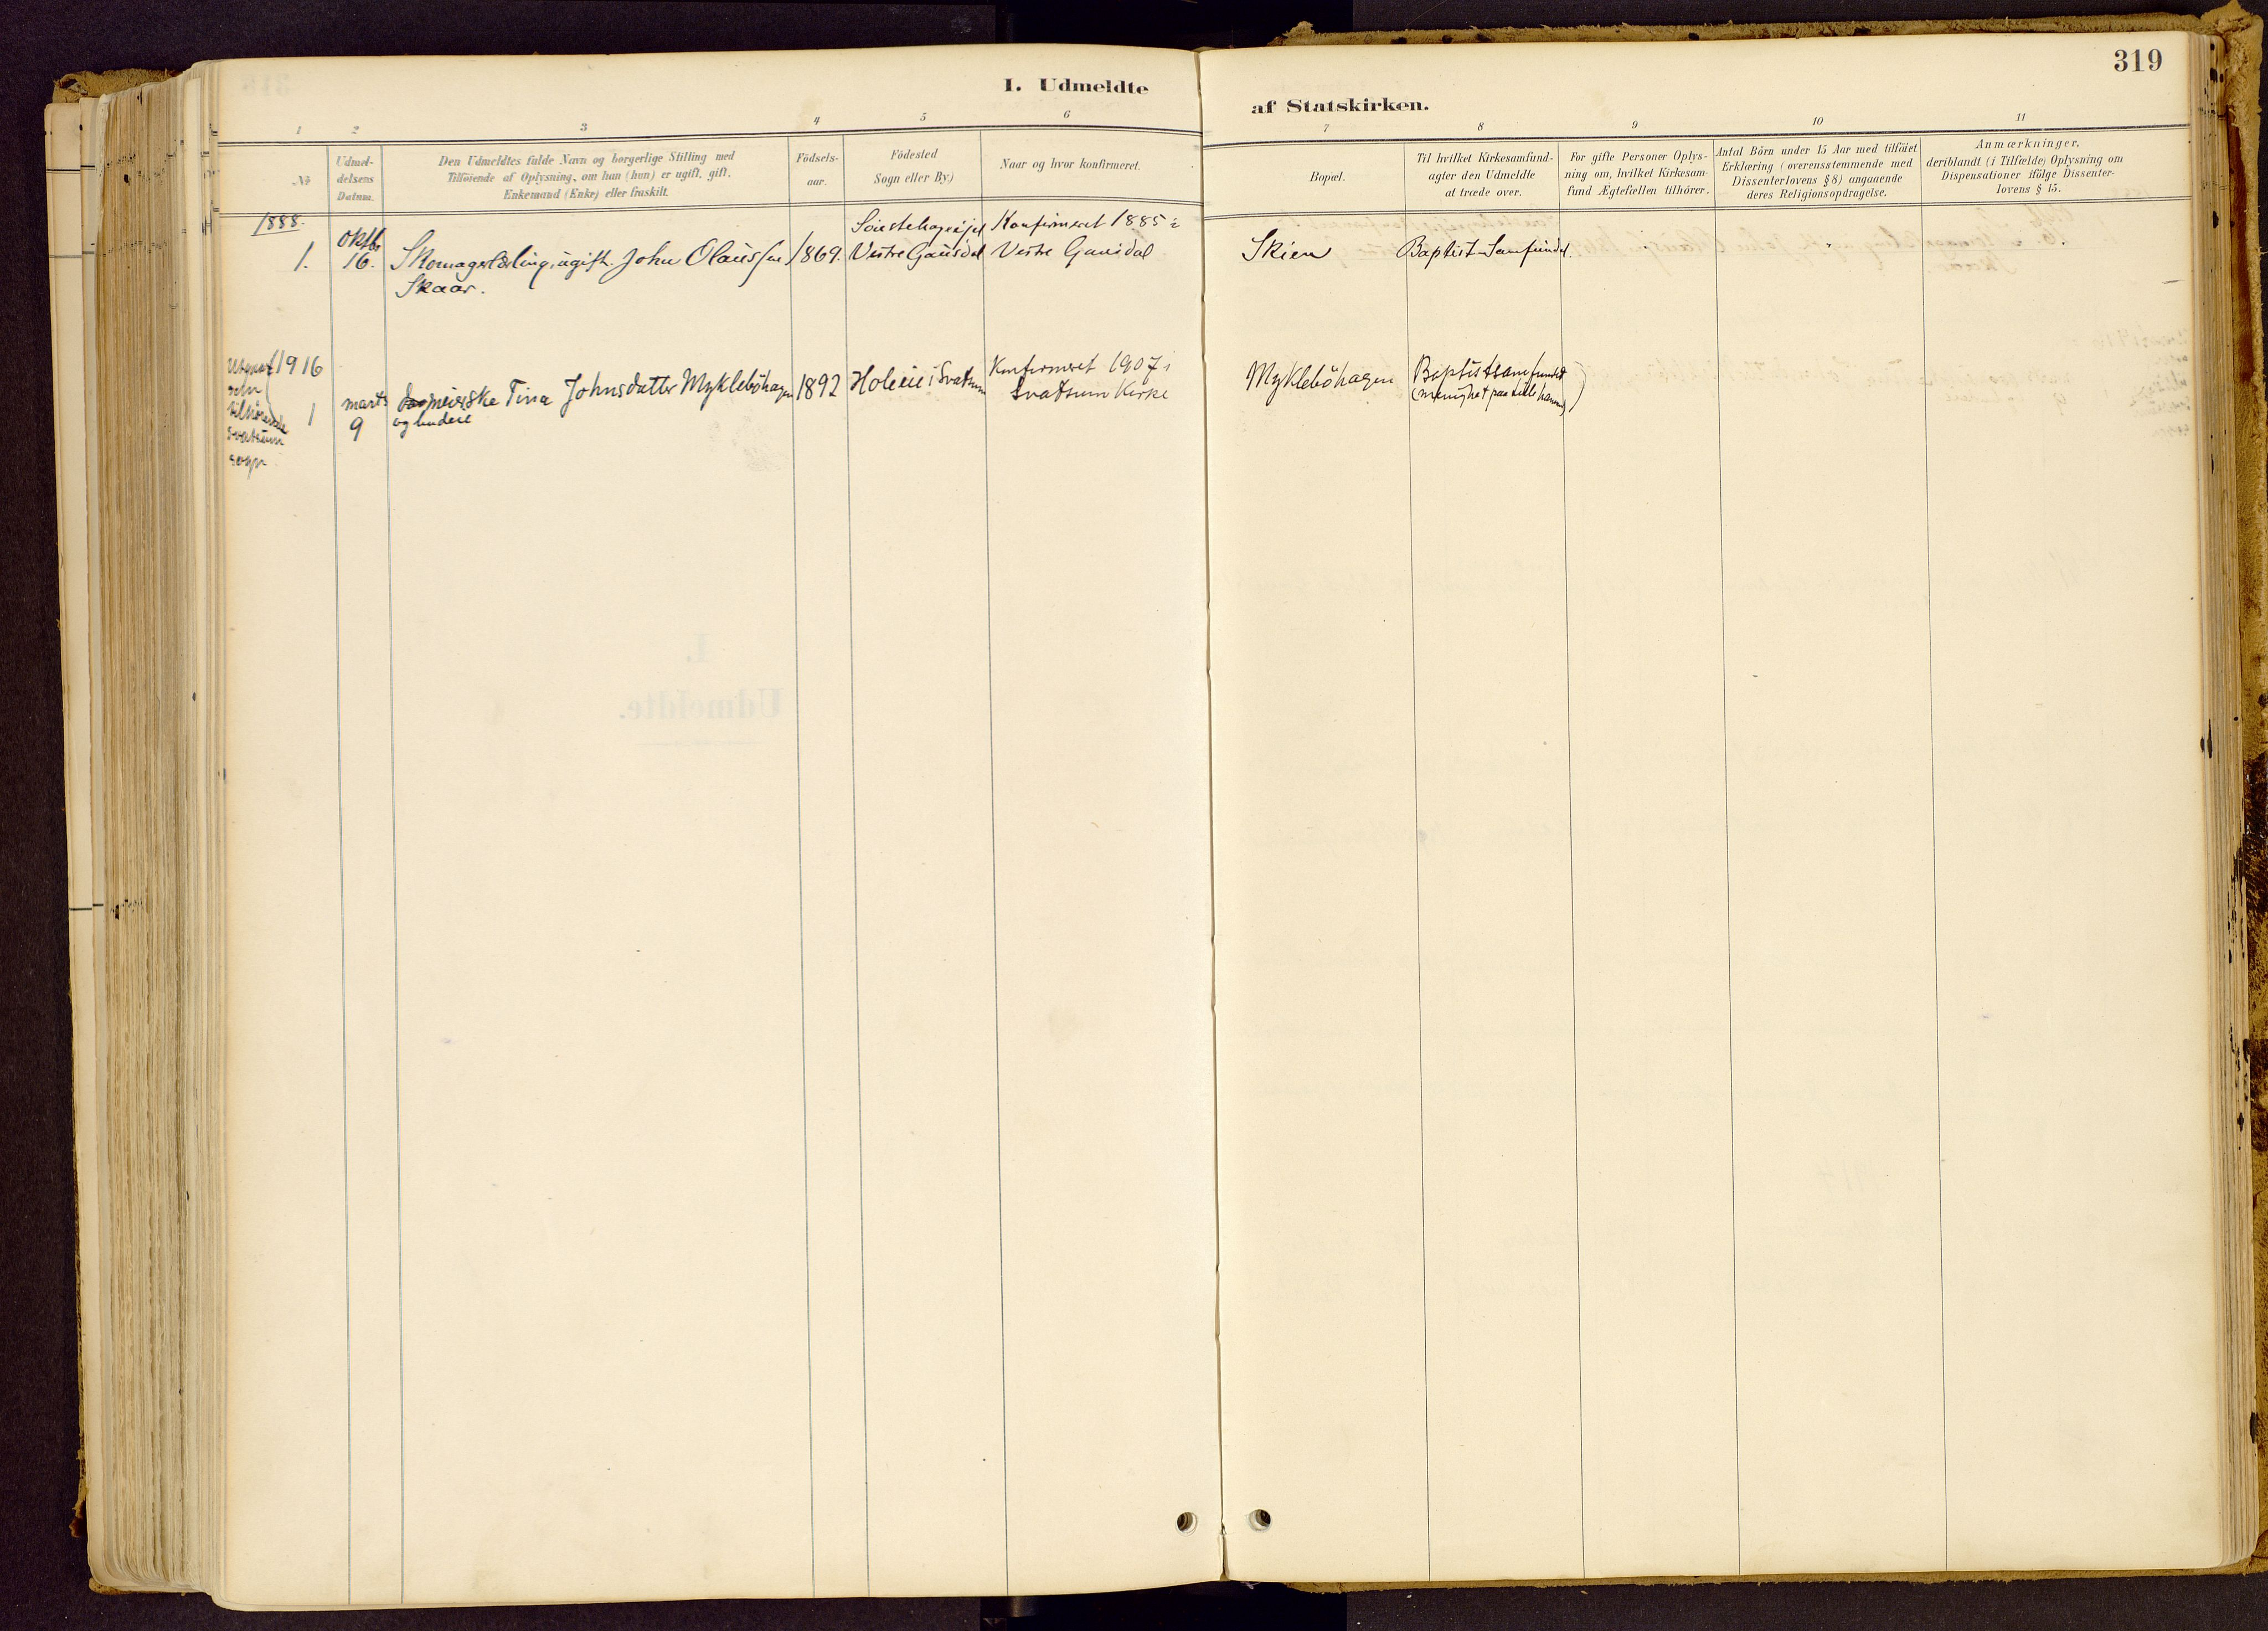 SAH, Vestre Gausdal prestekontor, Ministerialbok nr. 1, 1887-1914, s. 319